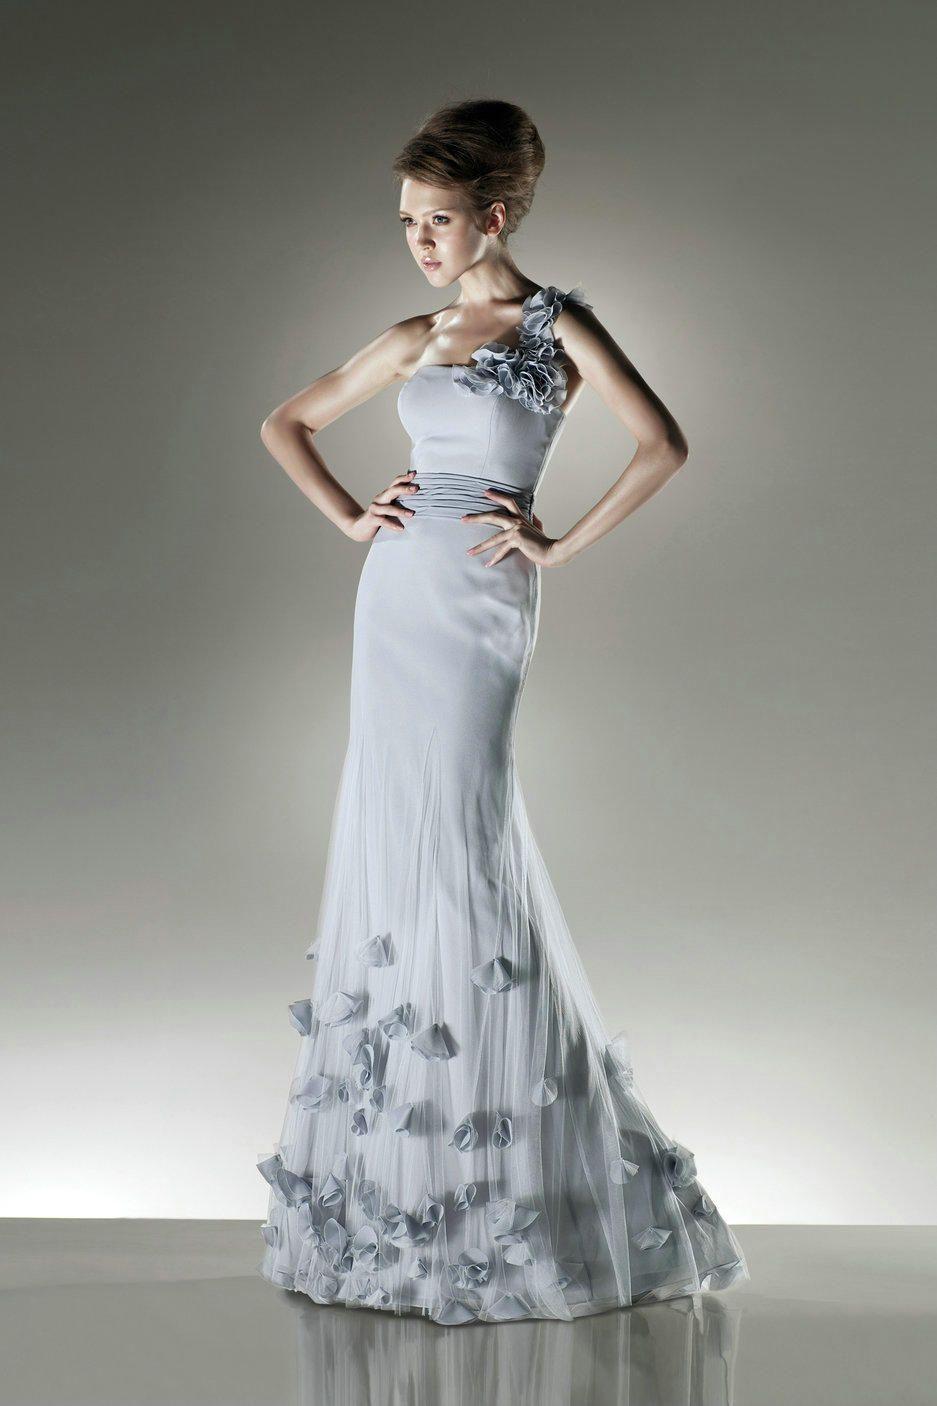 One Shoulder Gorgeous Light Blue Evening Formal Dress With Floral ...